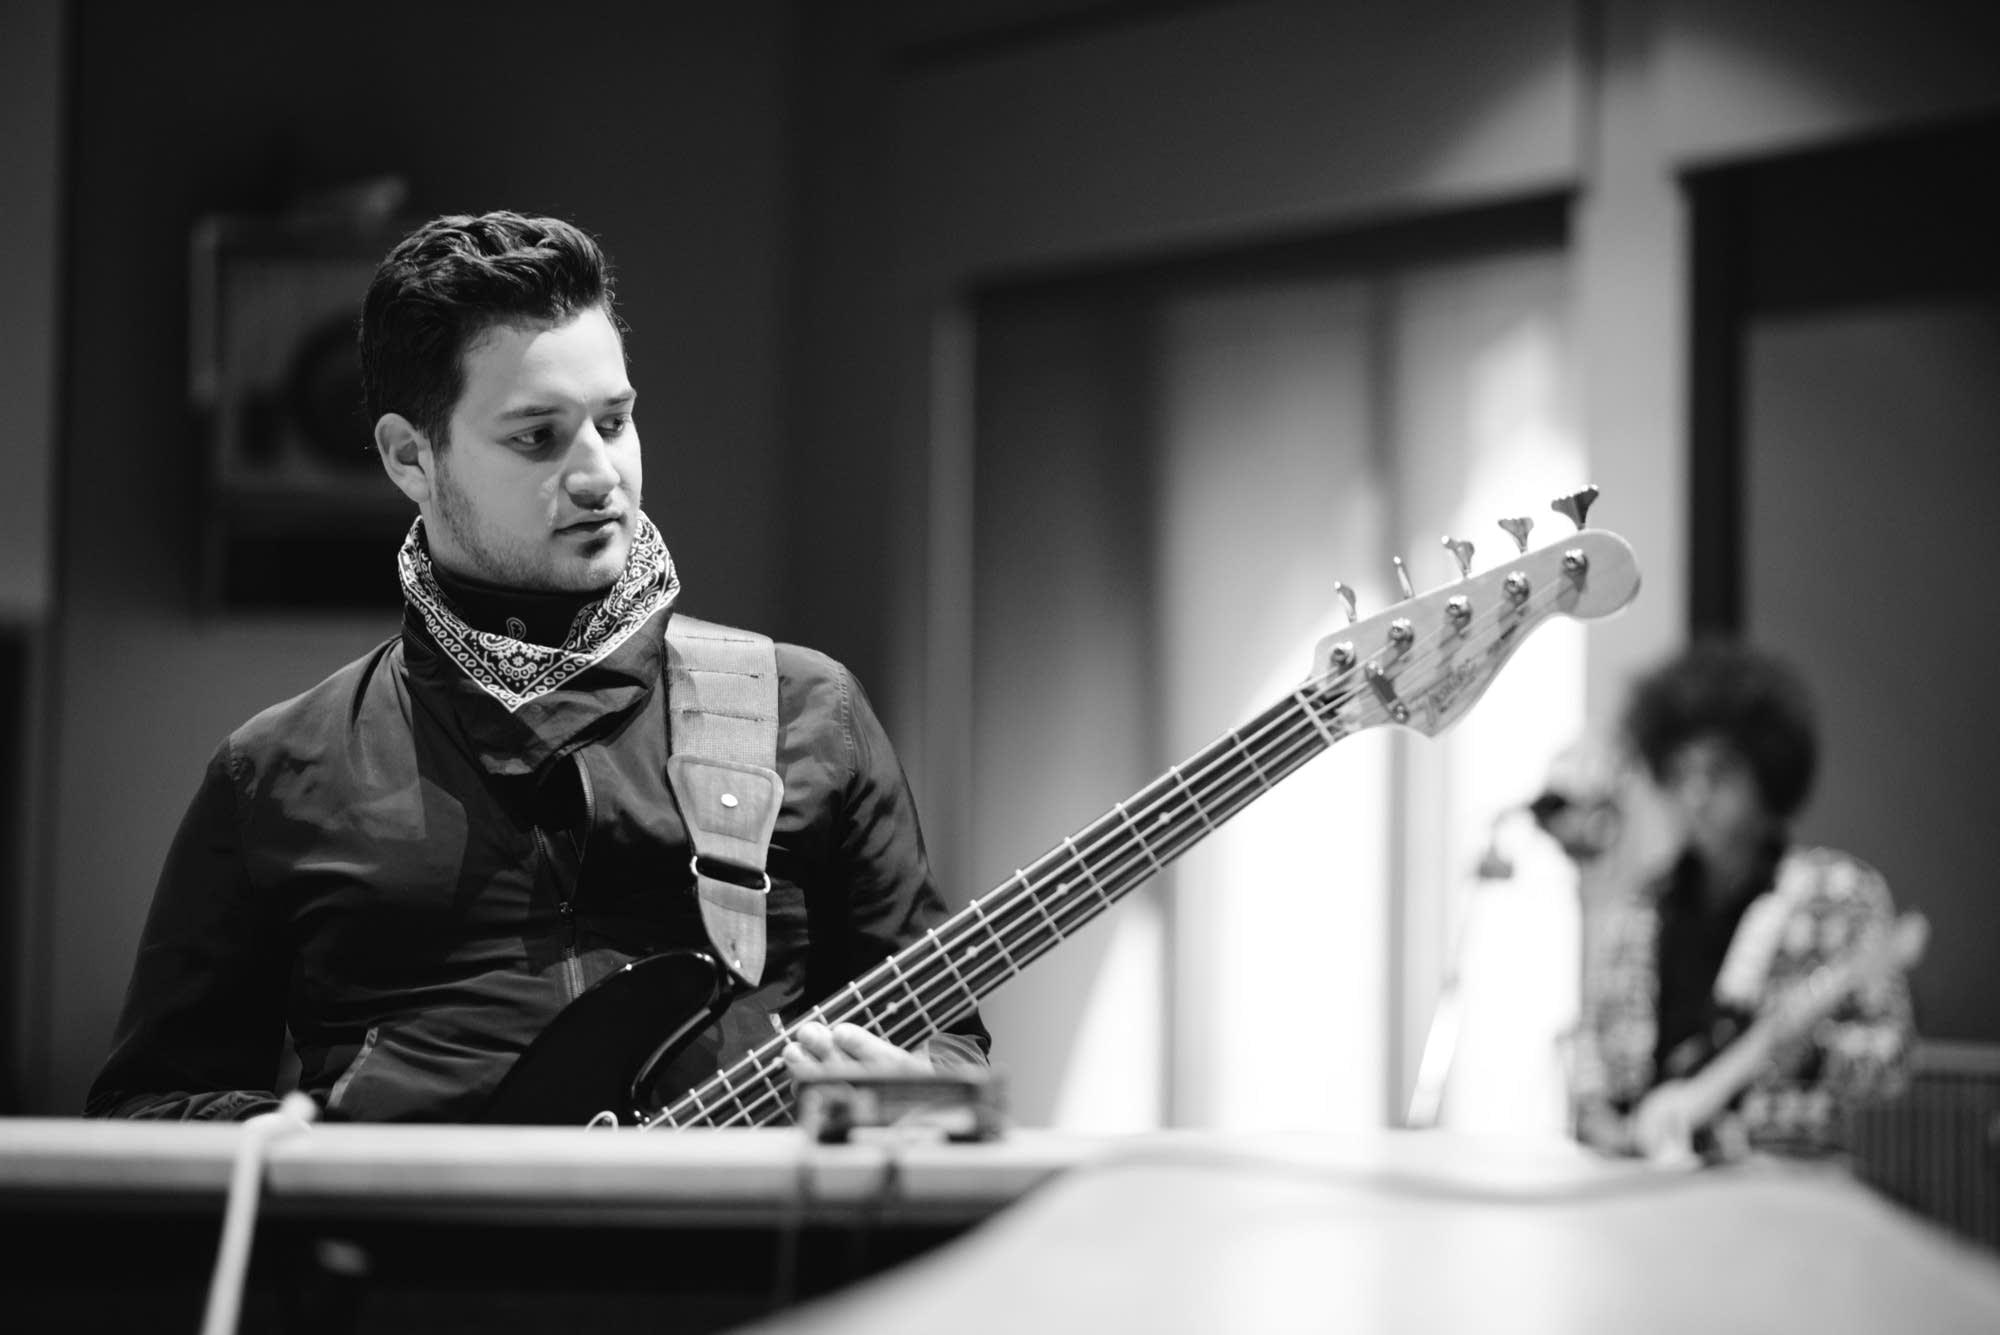 Ethan Yeshaya in The Current's studio